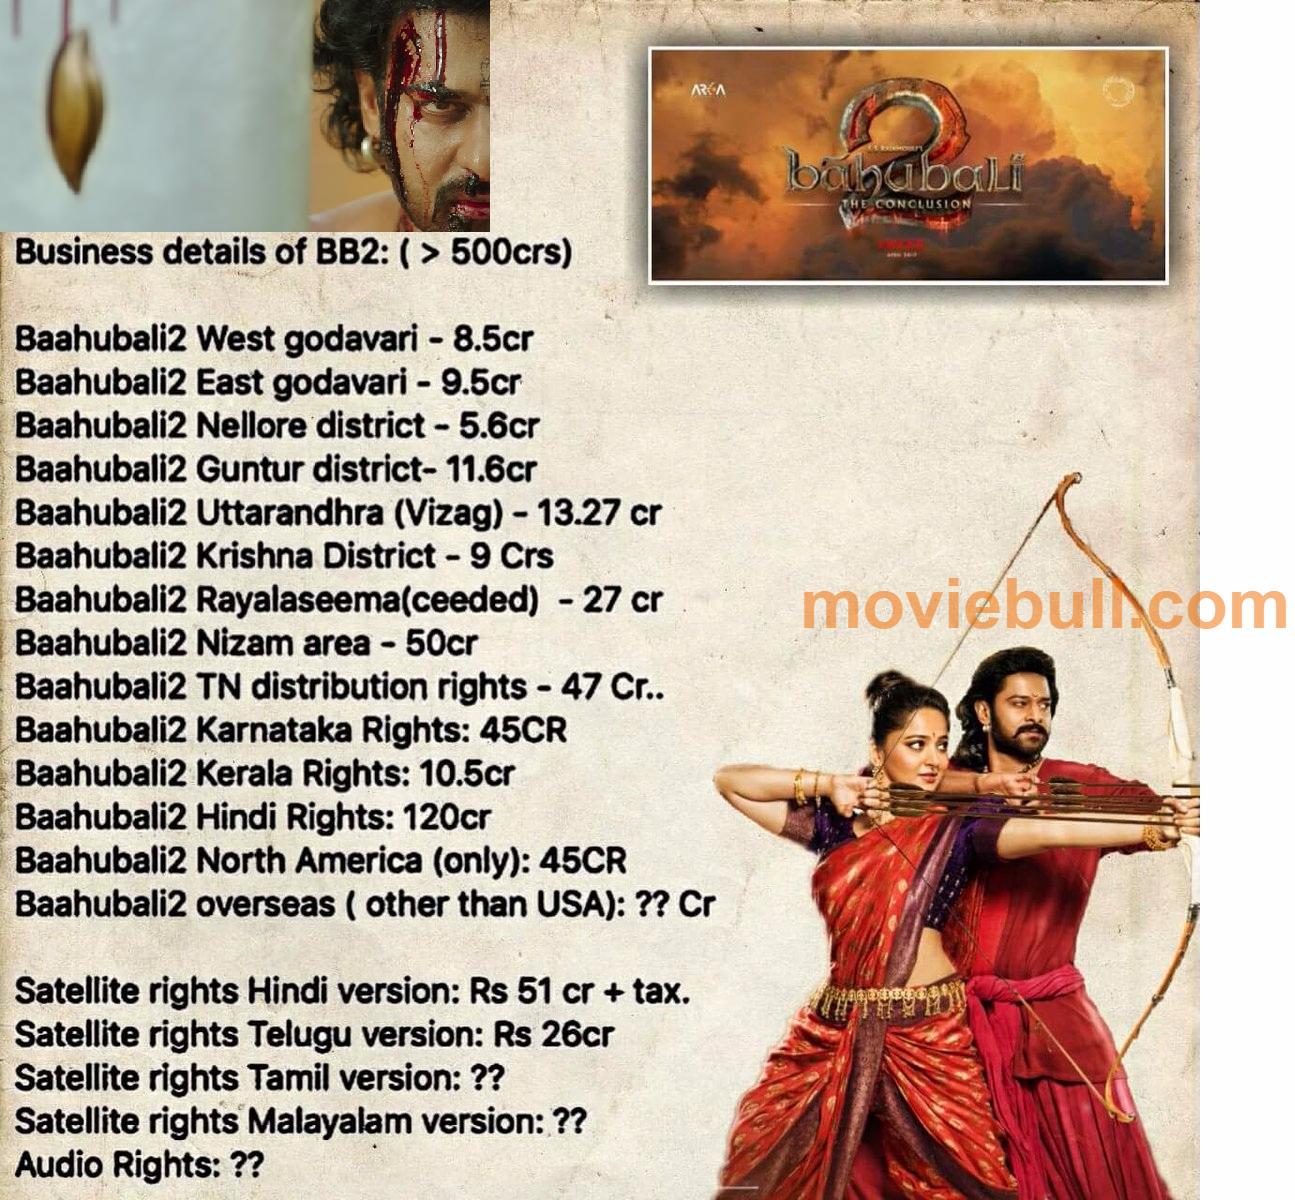 Bahubali 2 Movie Budget Bahubali 2 Images Bahubali 2 Photos Bahubali 2 Hd Images Bahubali 2 Hd Photos Bahubali 2 Wallpa Bahubali 2 Fun Facts Special Guest